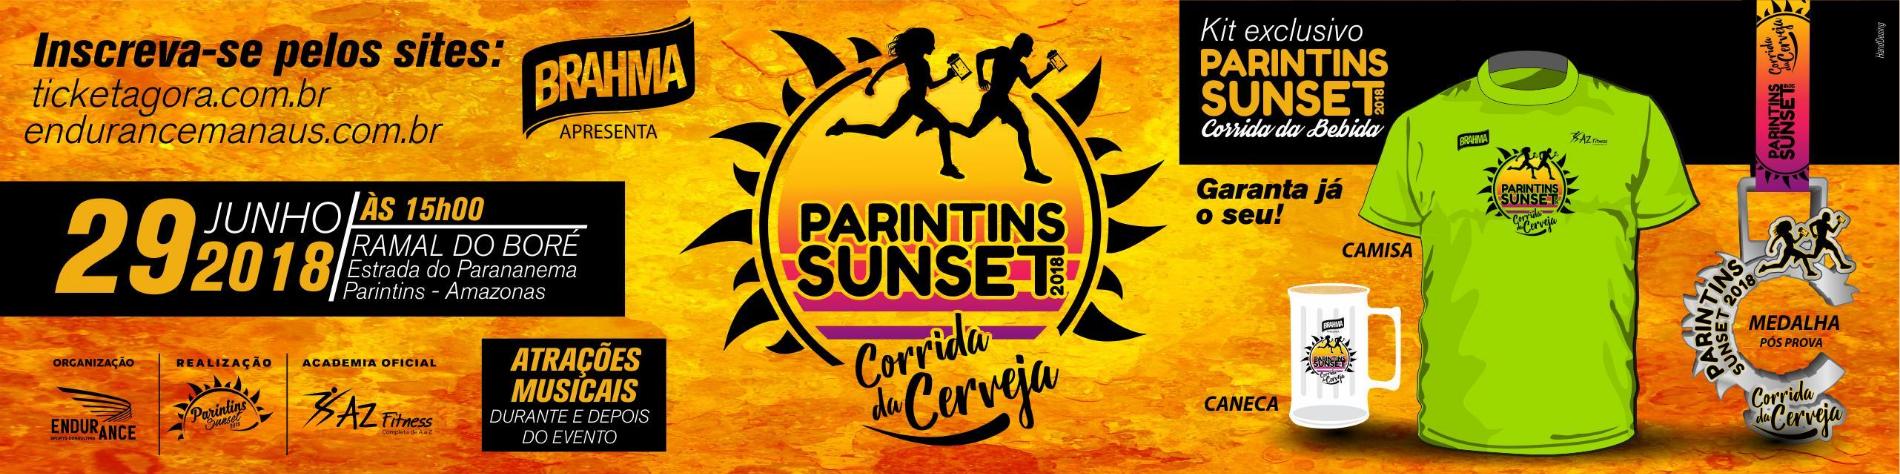 PARINTINS SUNSET - CORRIDA DA CERVEJA 2018 - Imagem de topo